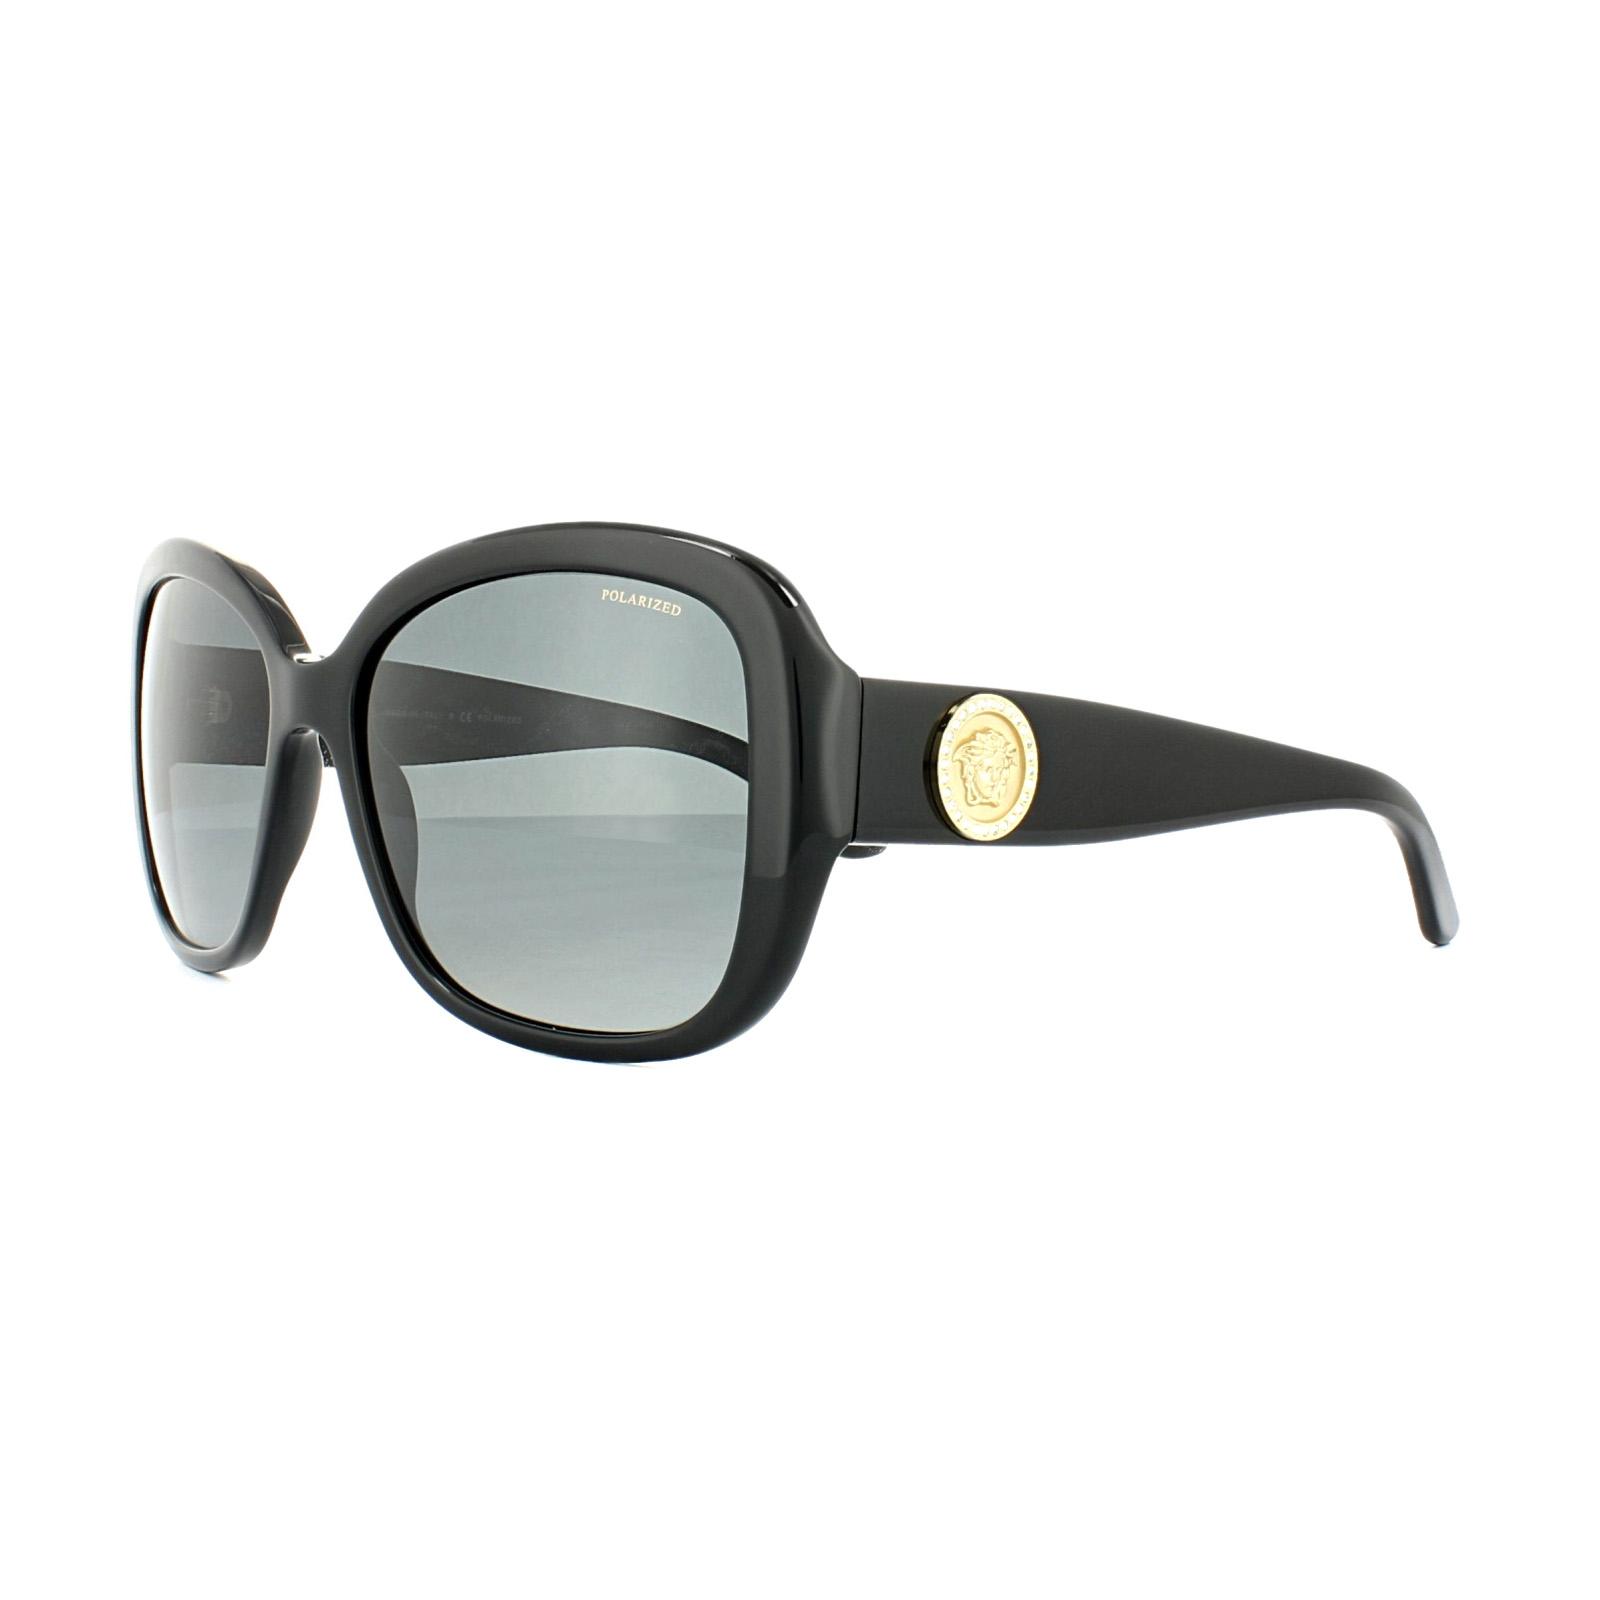 6bf00486aa30 Cheap Versace 4278B Sunglasses - Discounted Sunglasses